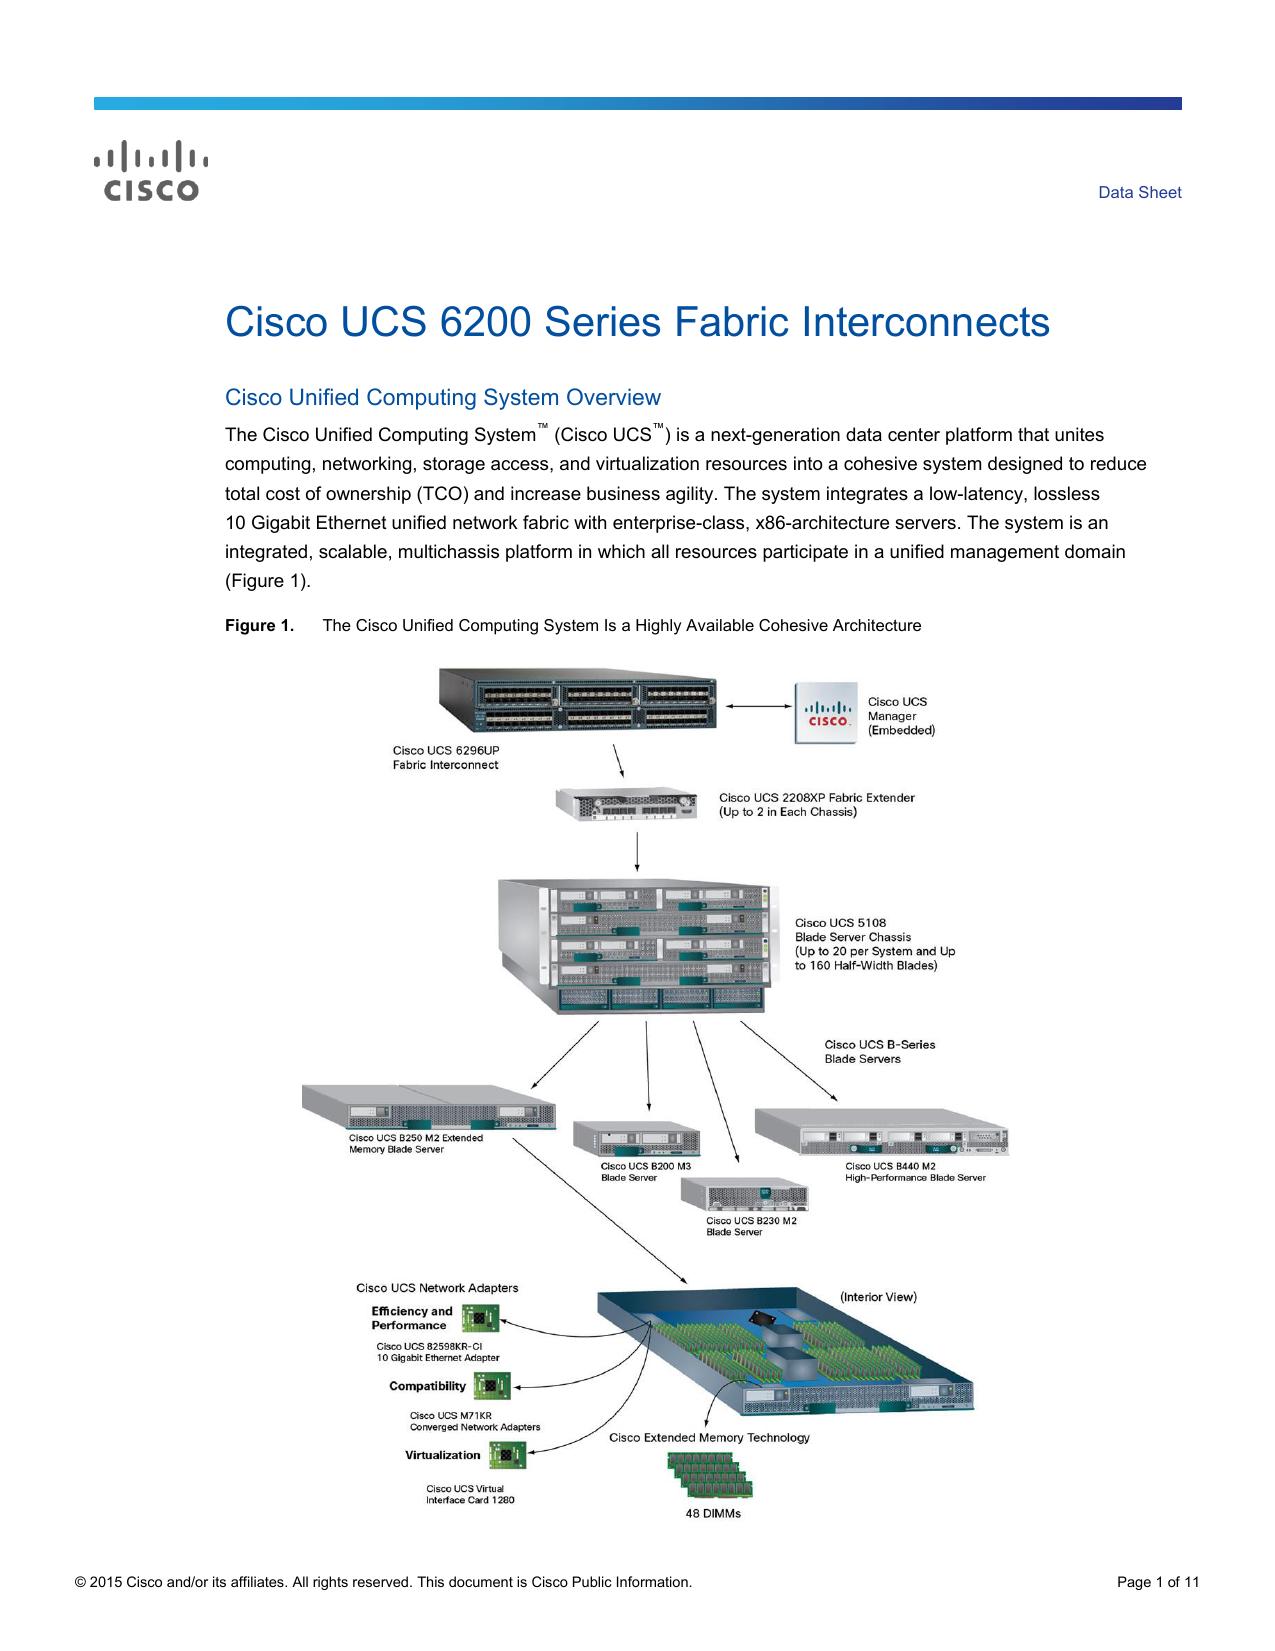 Cisco UCS 6200 Series Fabric Interconnects Data Sheet